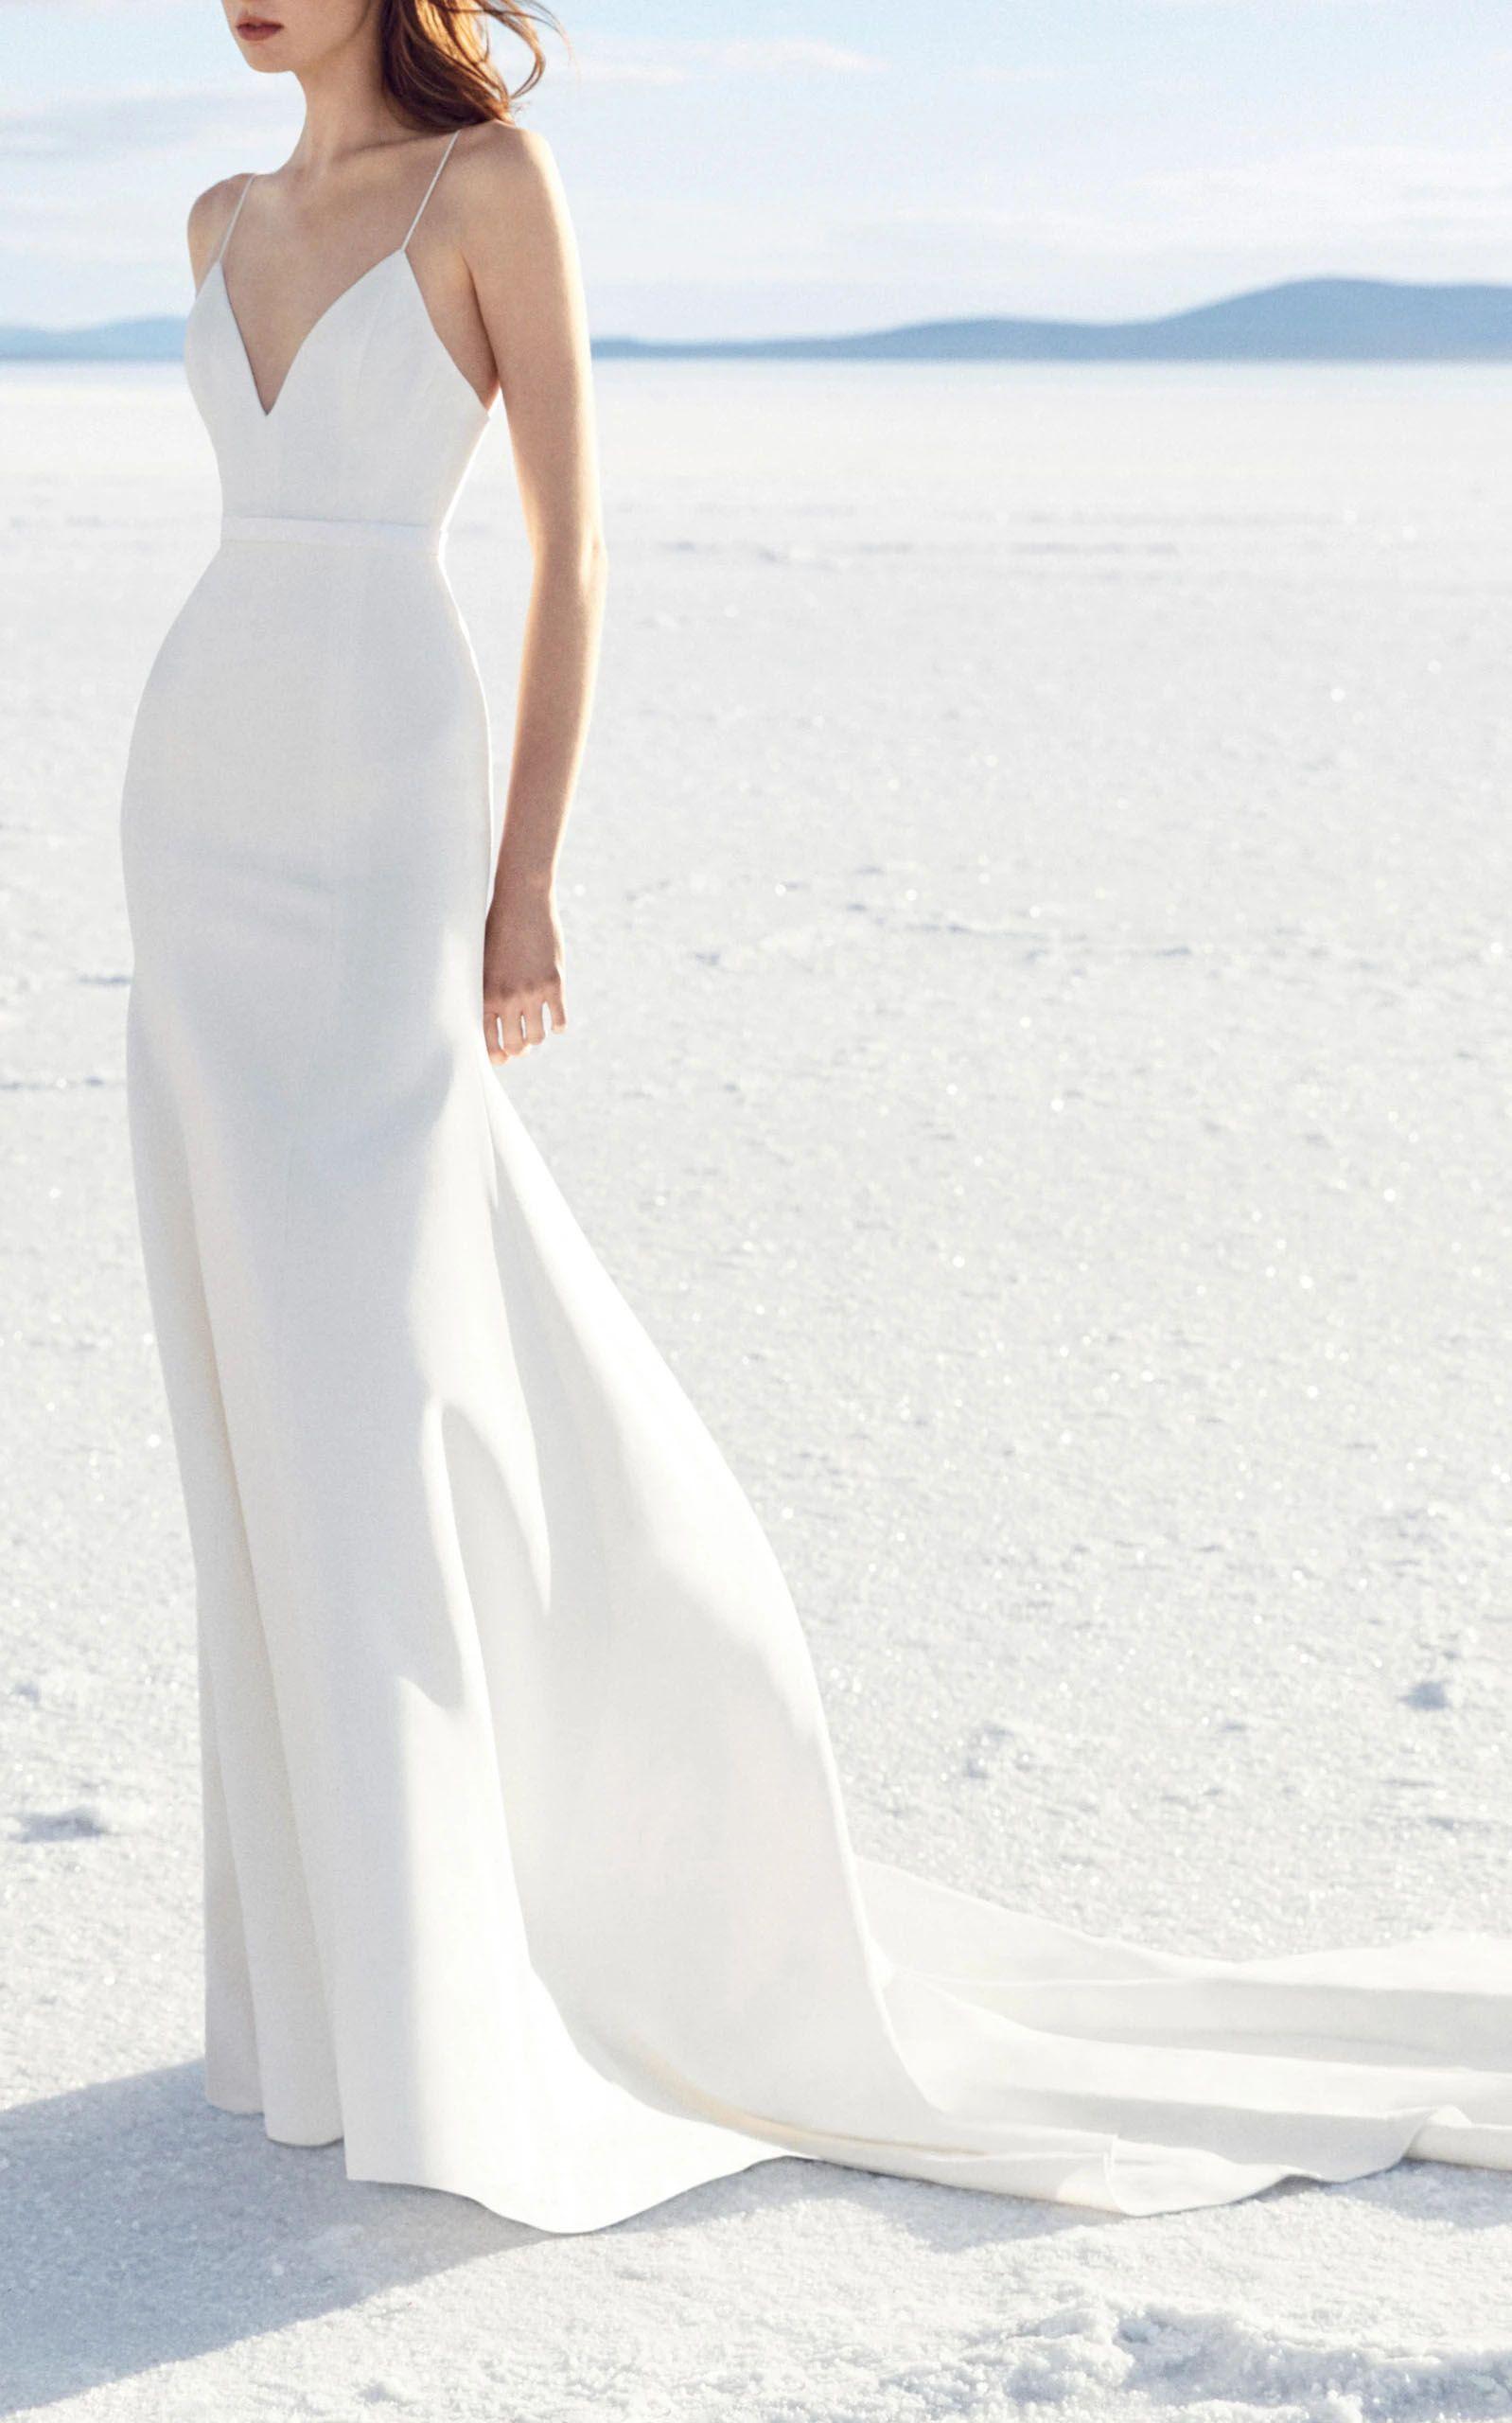 Modern White Satin V Neck Mermaid Beach Wedding Gown Wedding Dress Fabrics Wedding Dresses Bridal Gowns